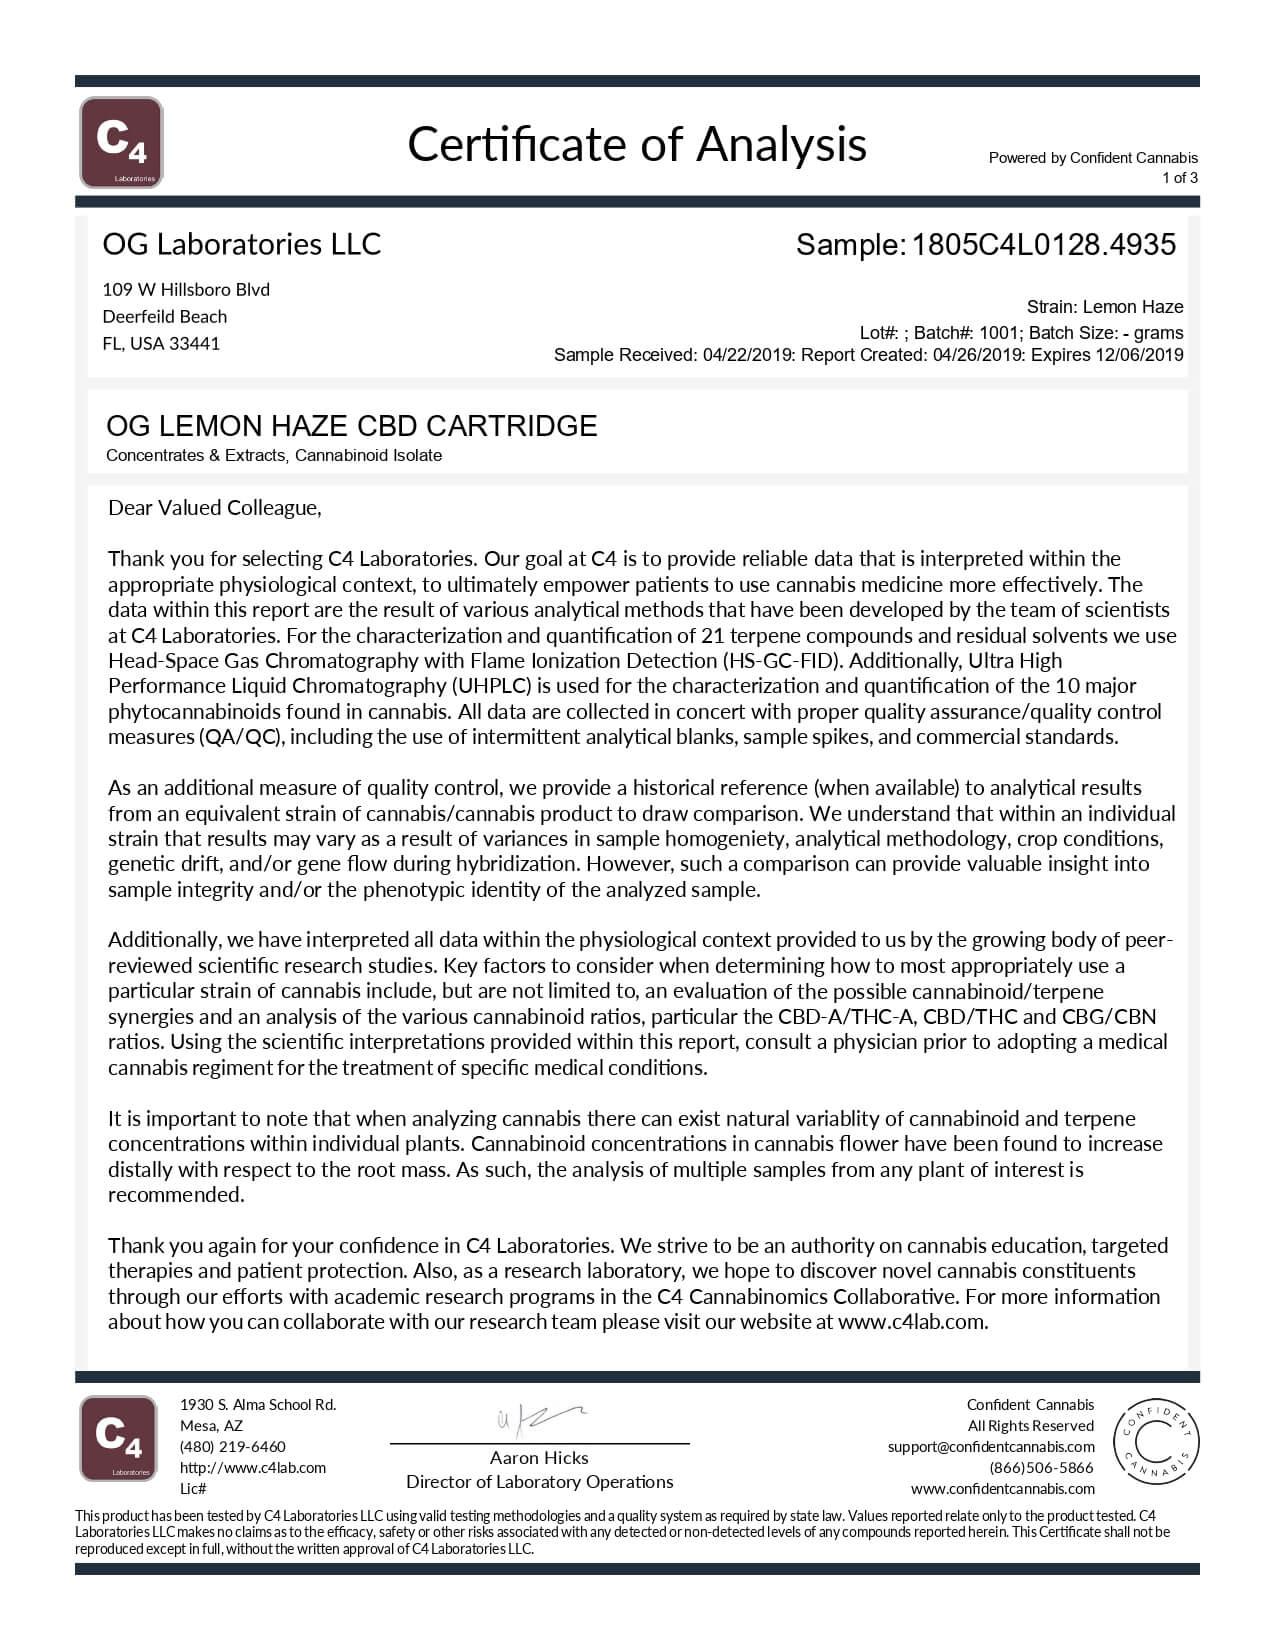 OG Labs CBD Cartridge Lemon Haze Lab Report